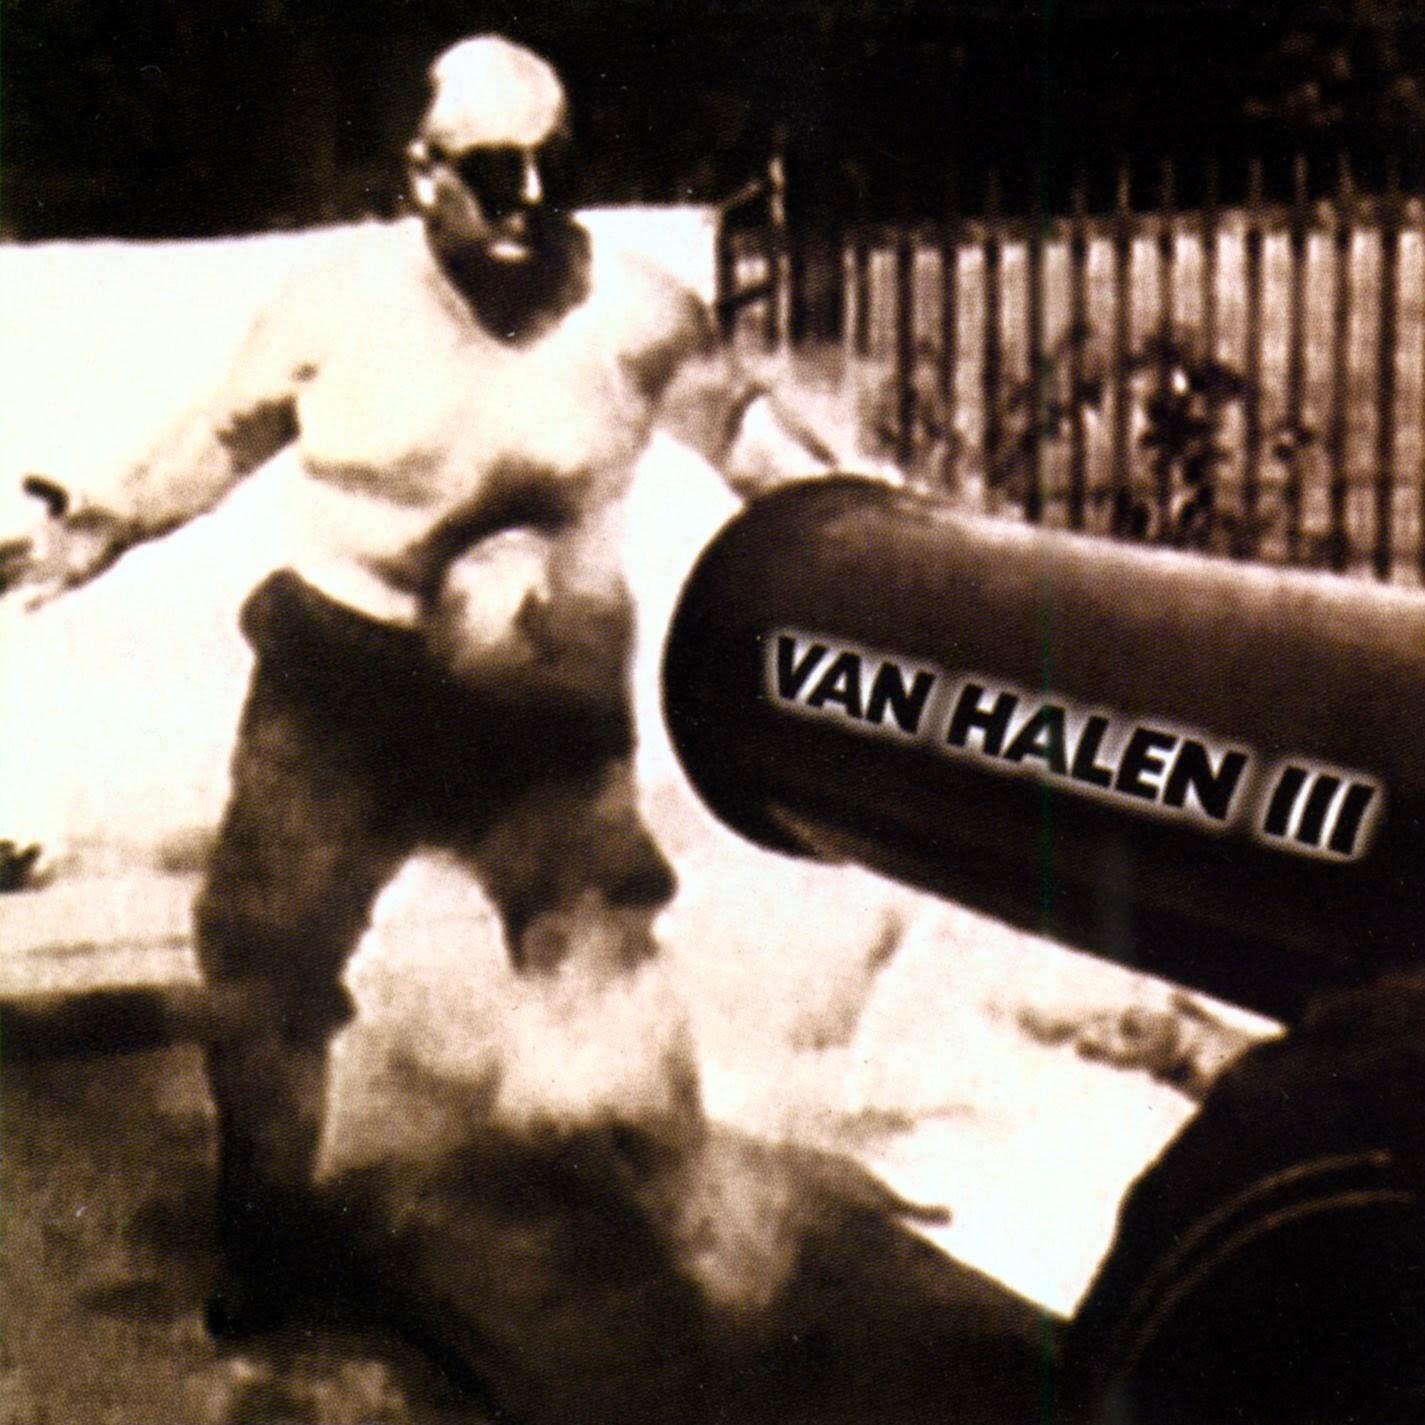 Halen Iii Van Halen Iii 1998 Produced